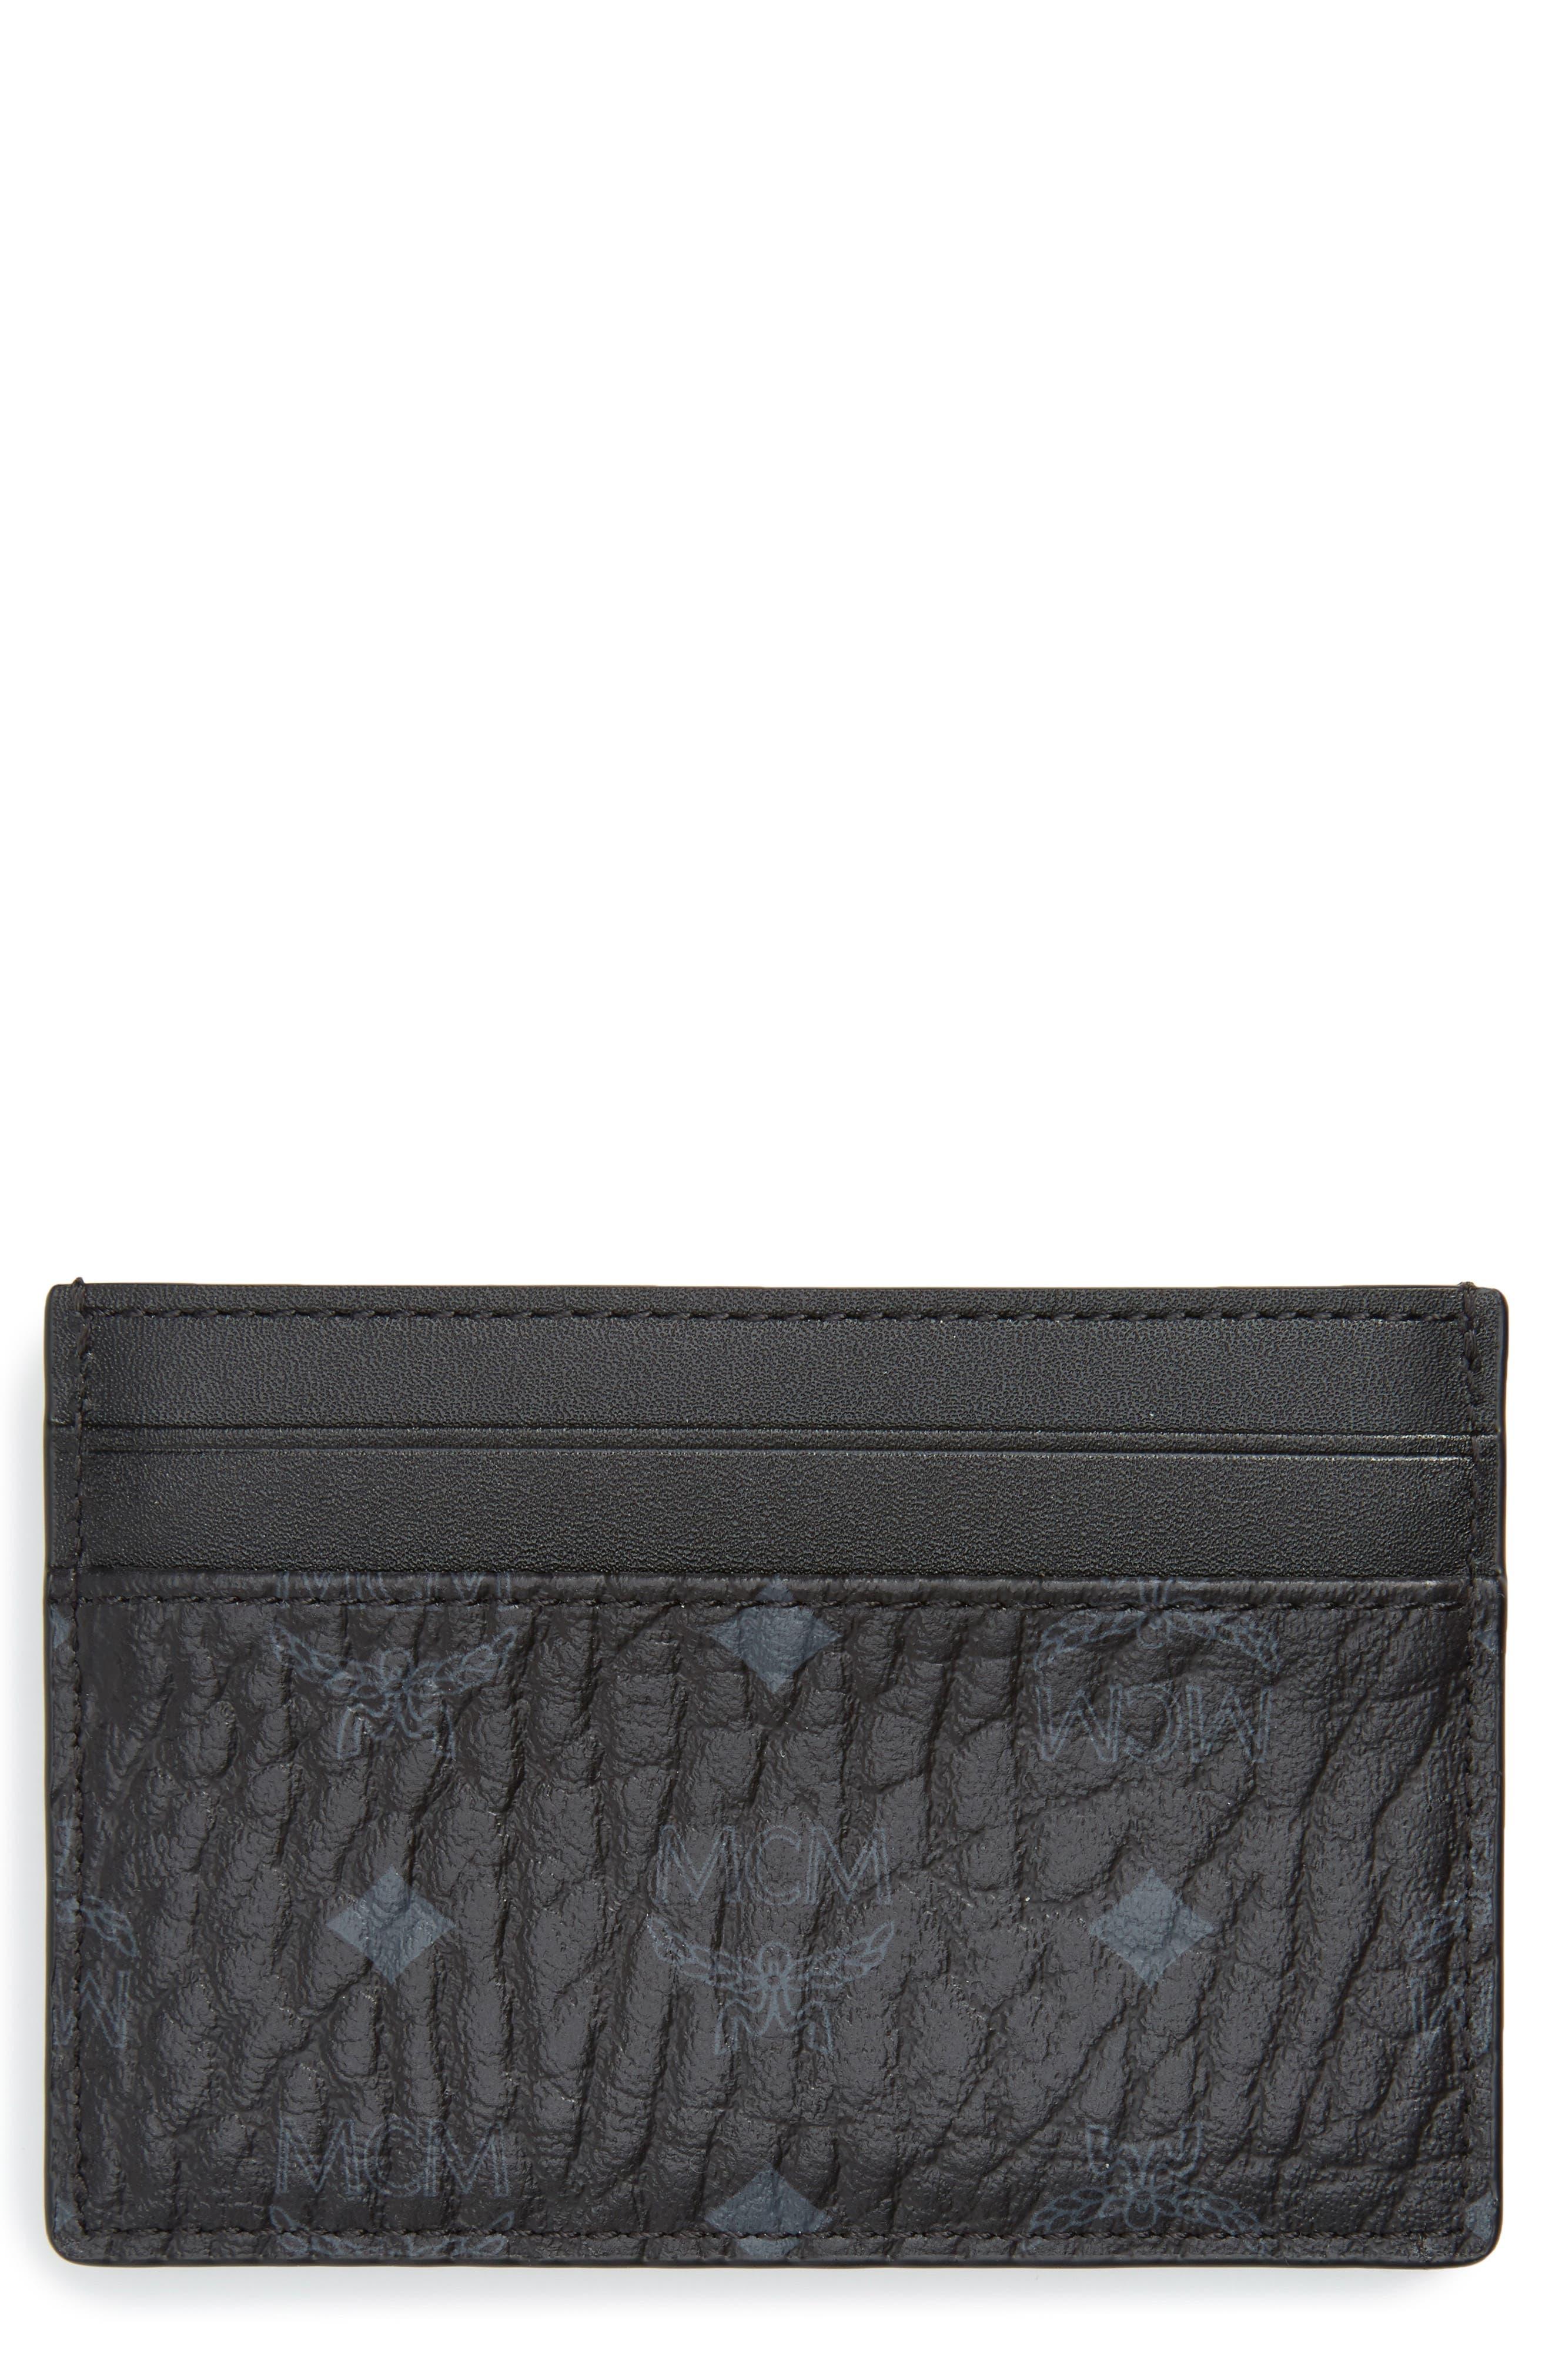 MCM Logo Leather Card Case, Main, color, BLACK